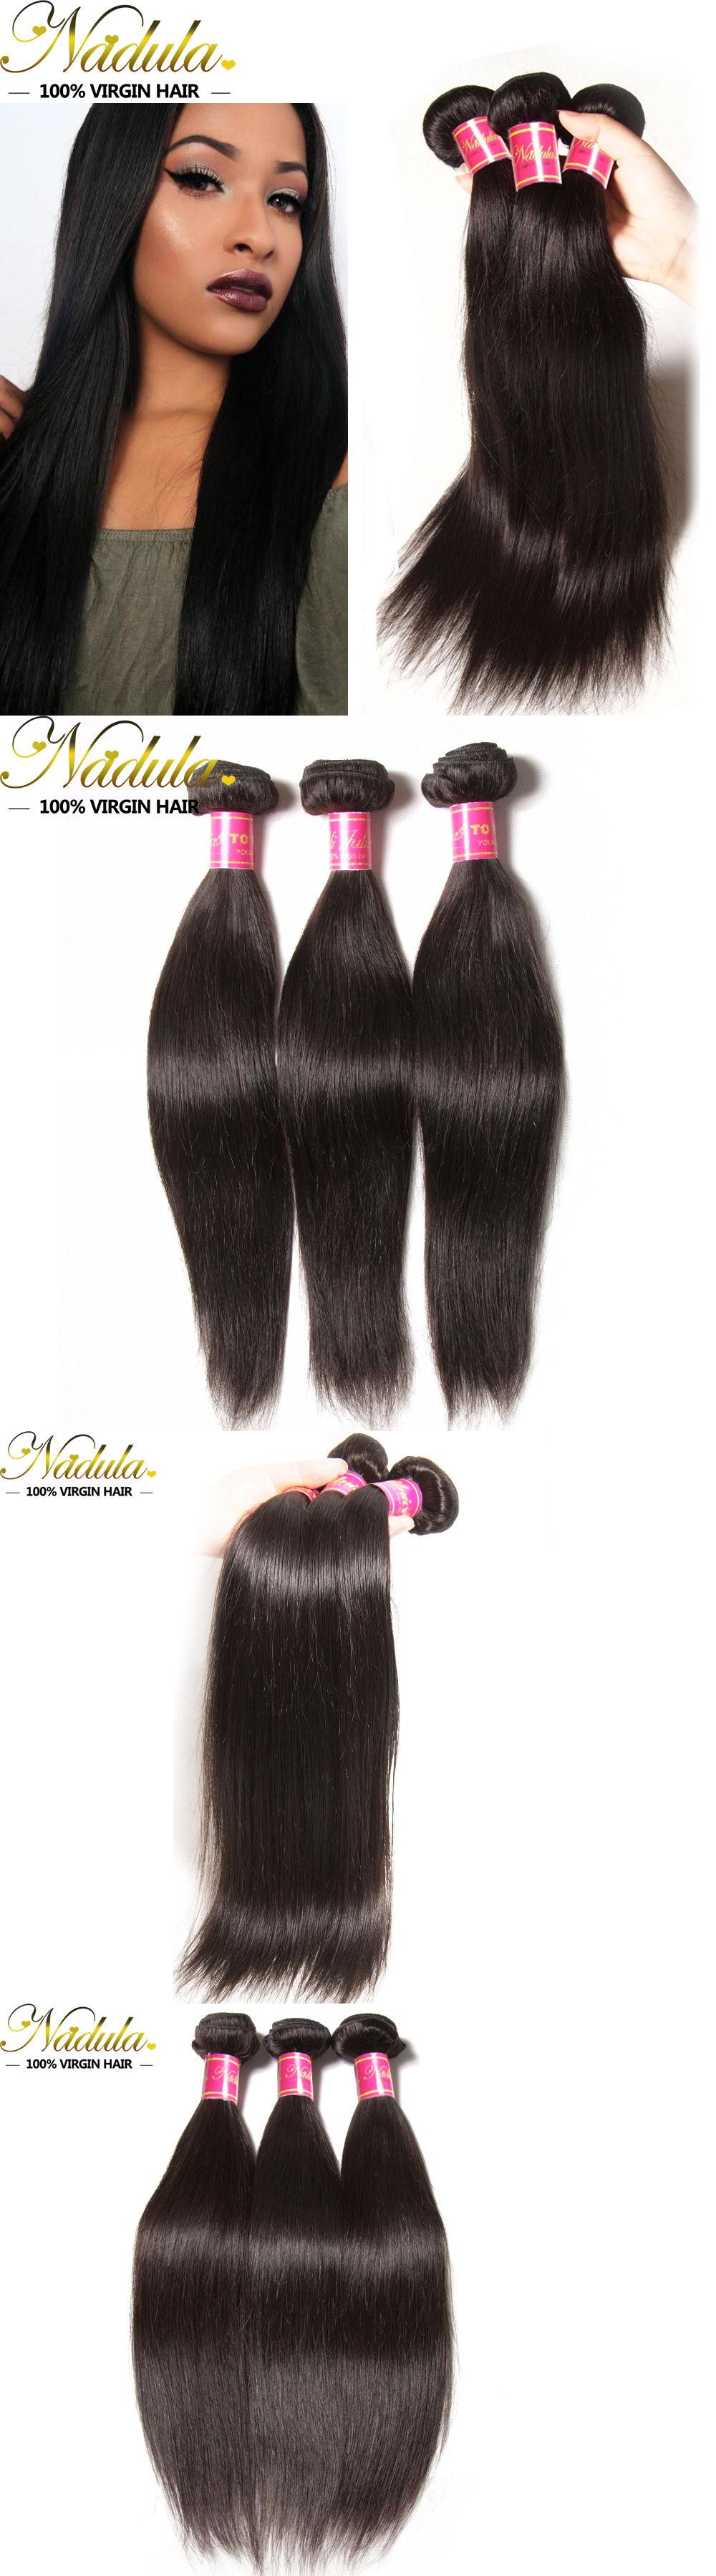 Hair Extensions 3bundles Brazilian Straight Hair 300g Unprocessed